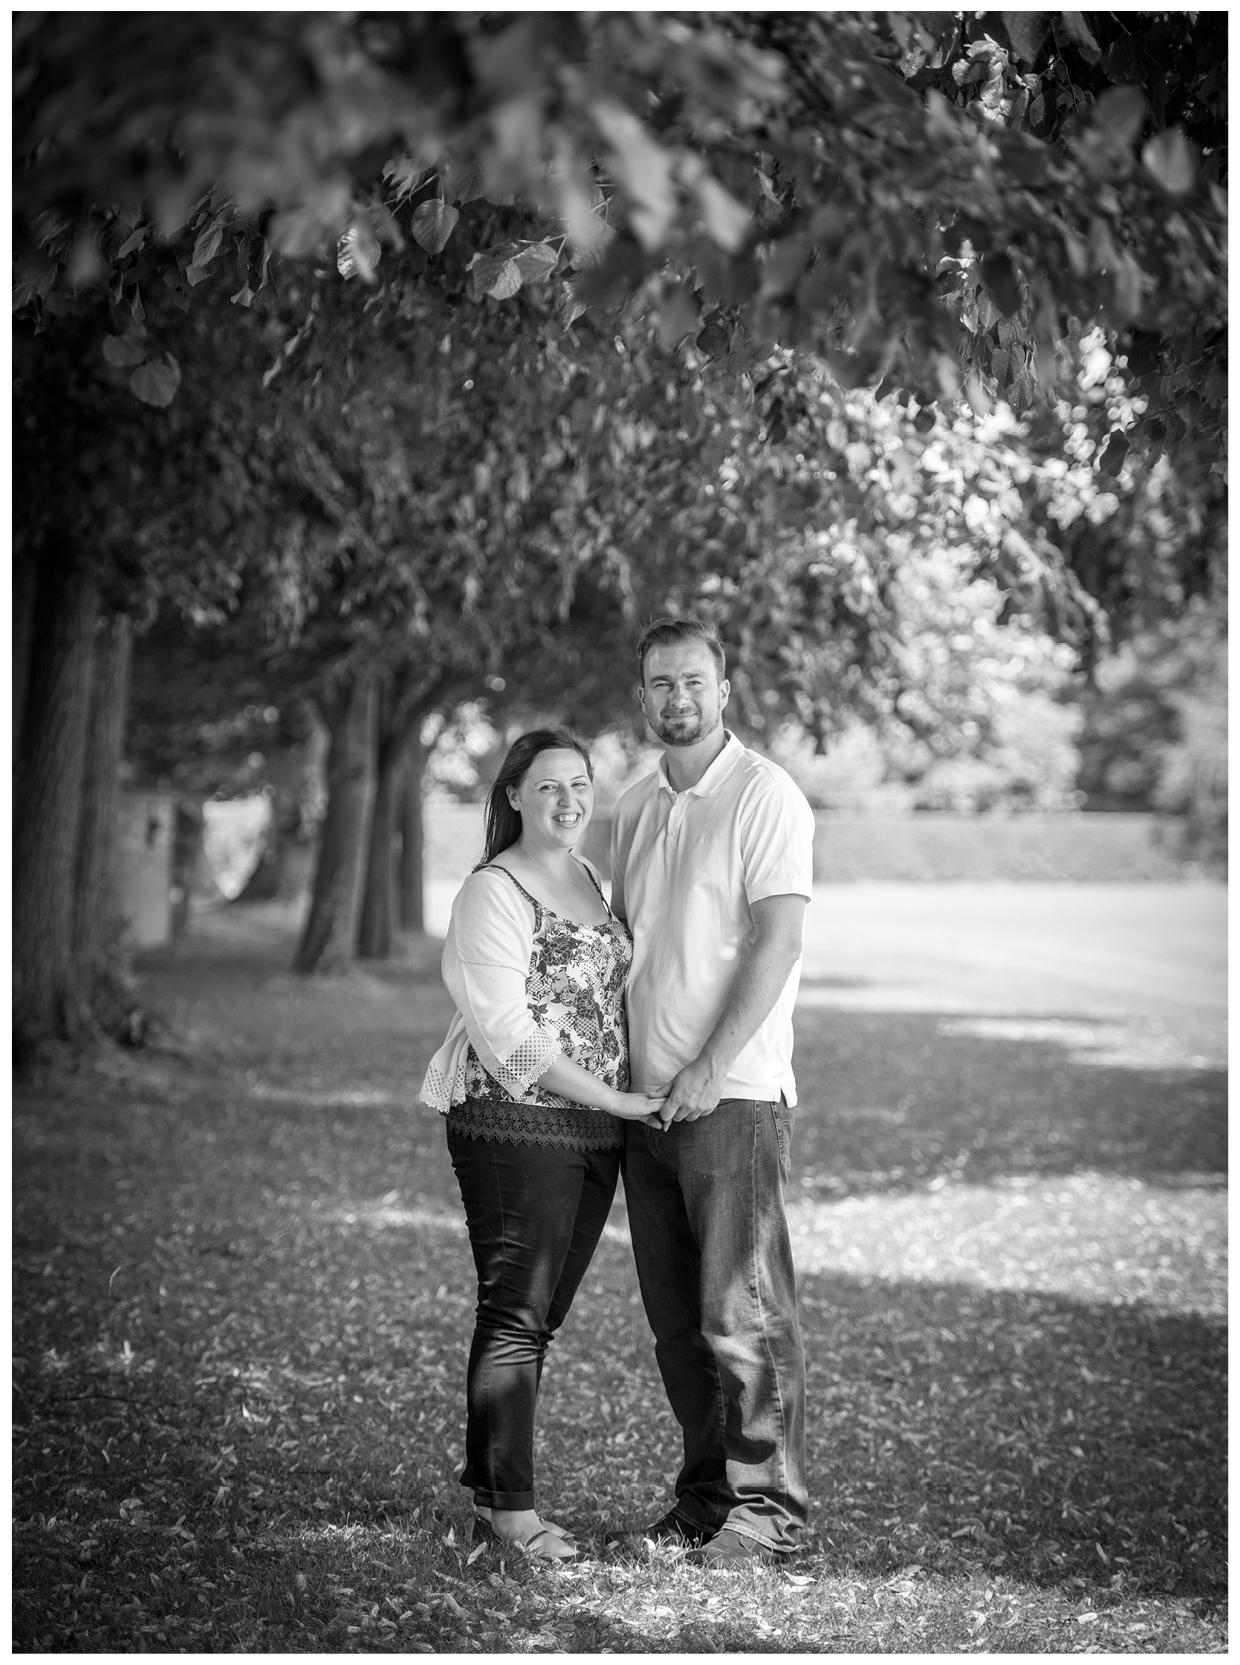 Sarah and Bryan8